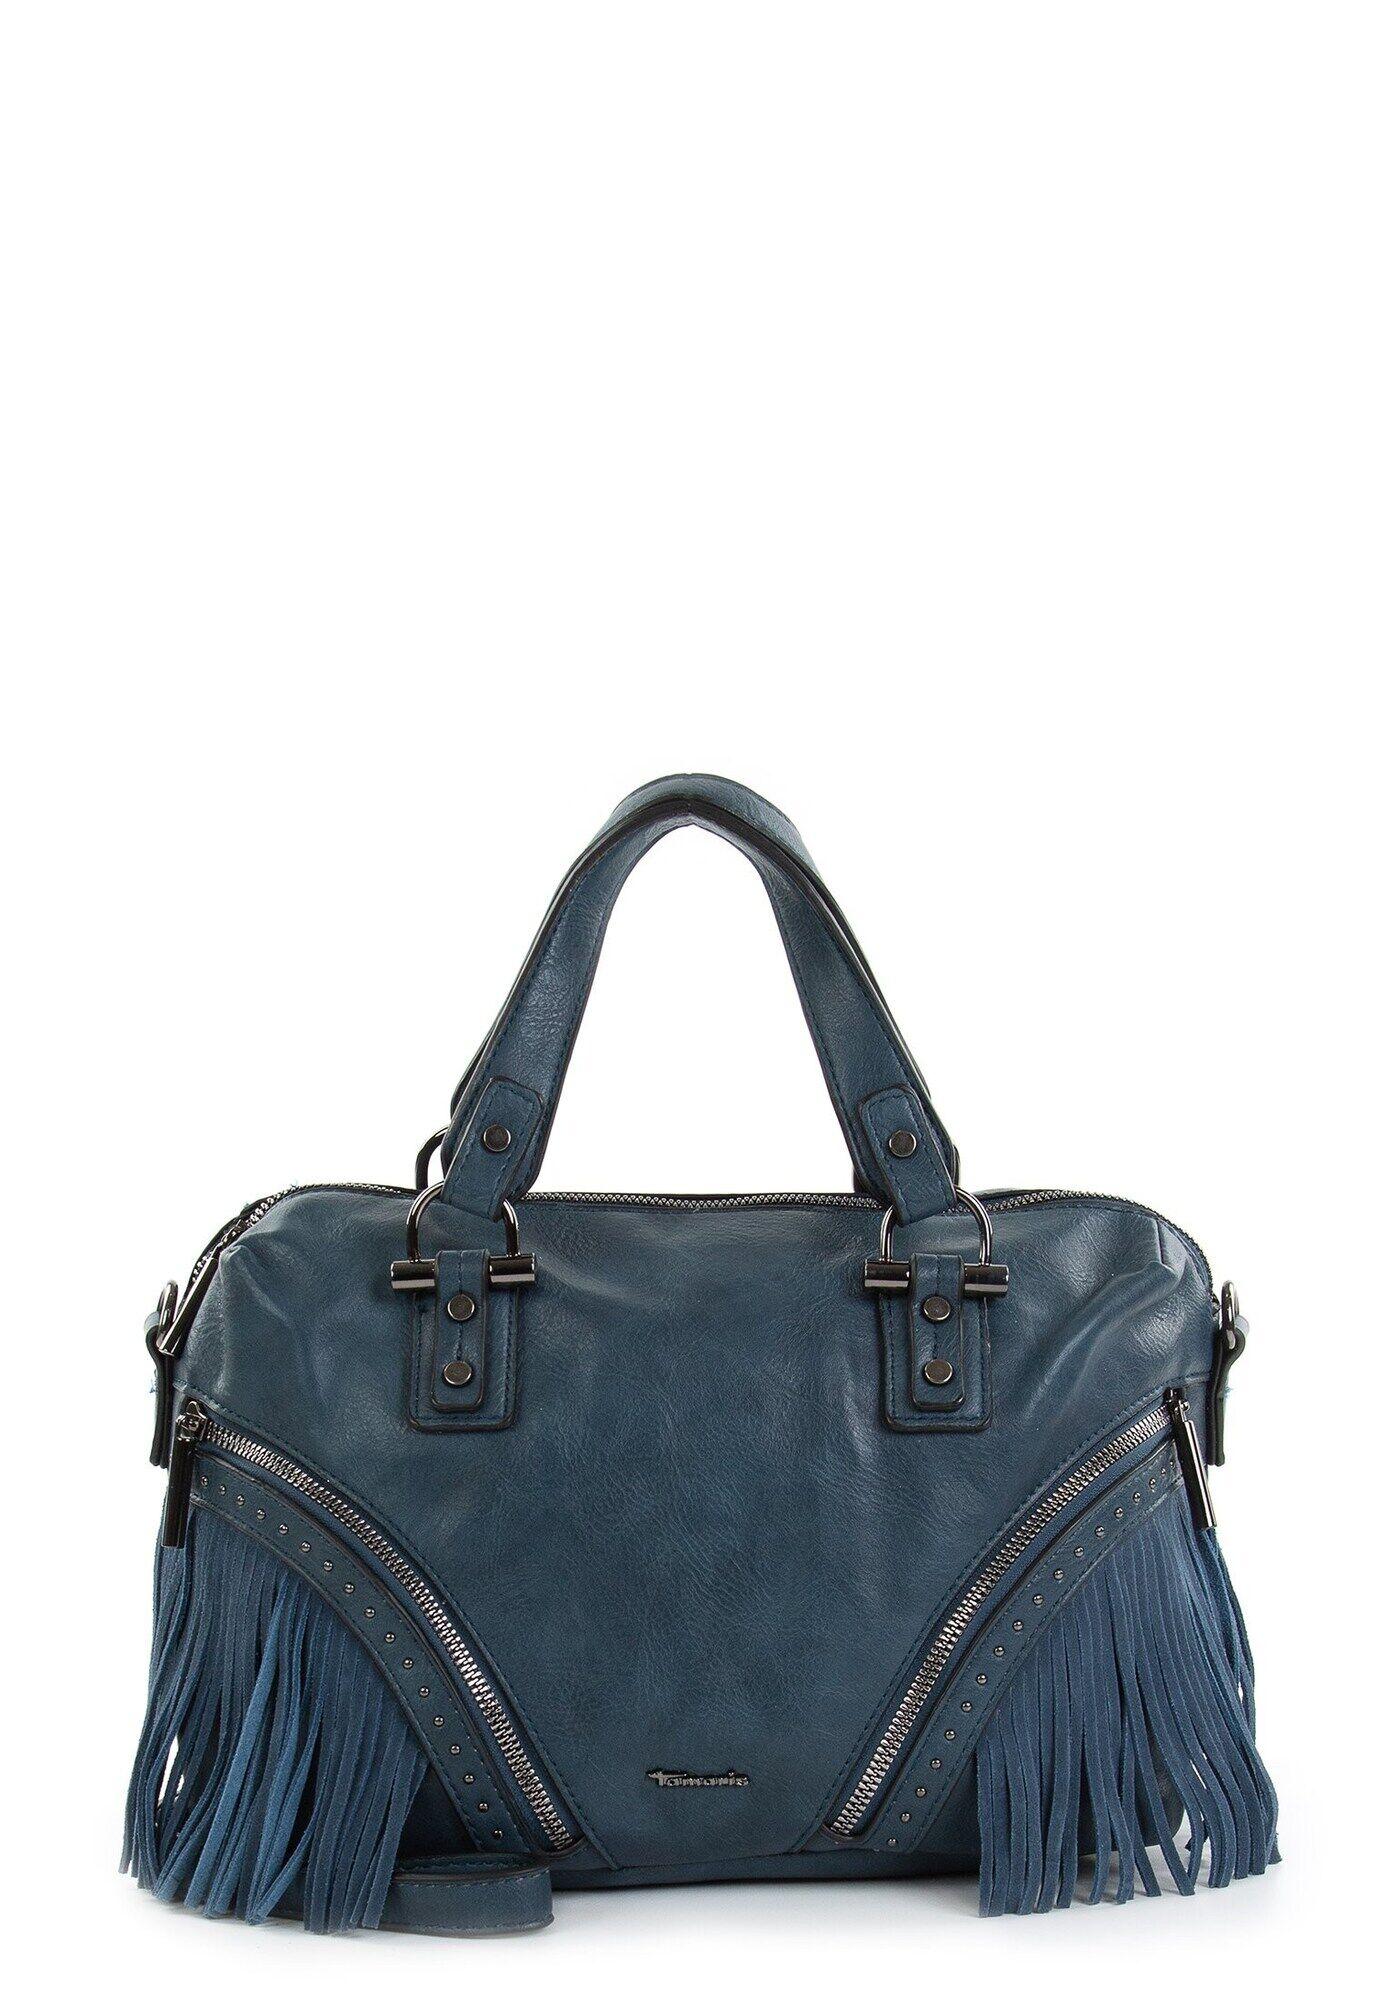 TAMARIS Sacs à main 'Denice Limited Edition'  - Bleu - Taille: One Size - female